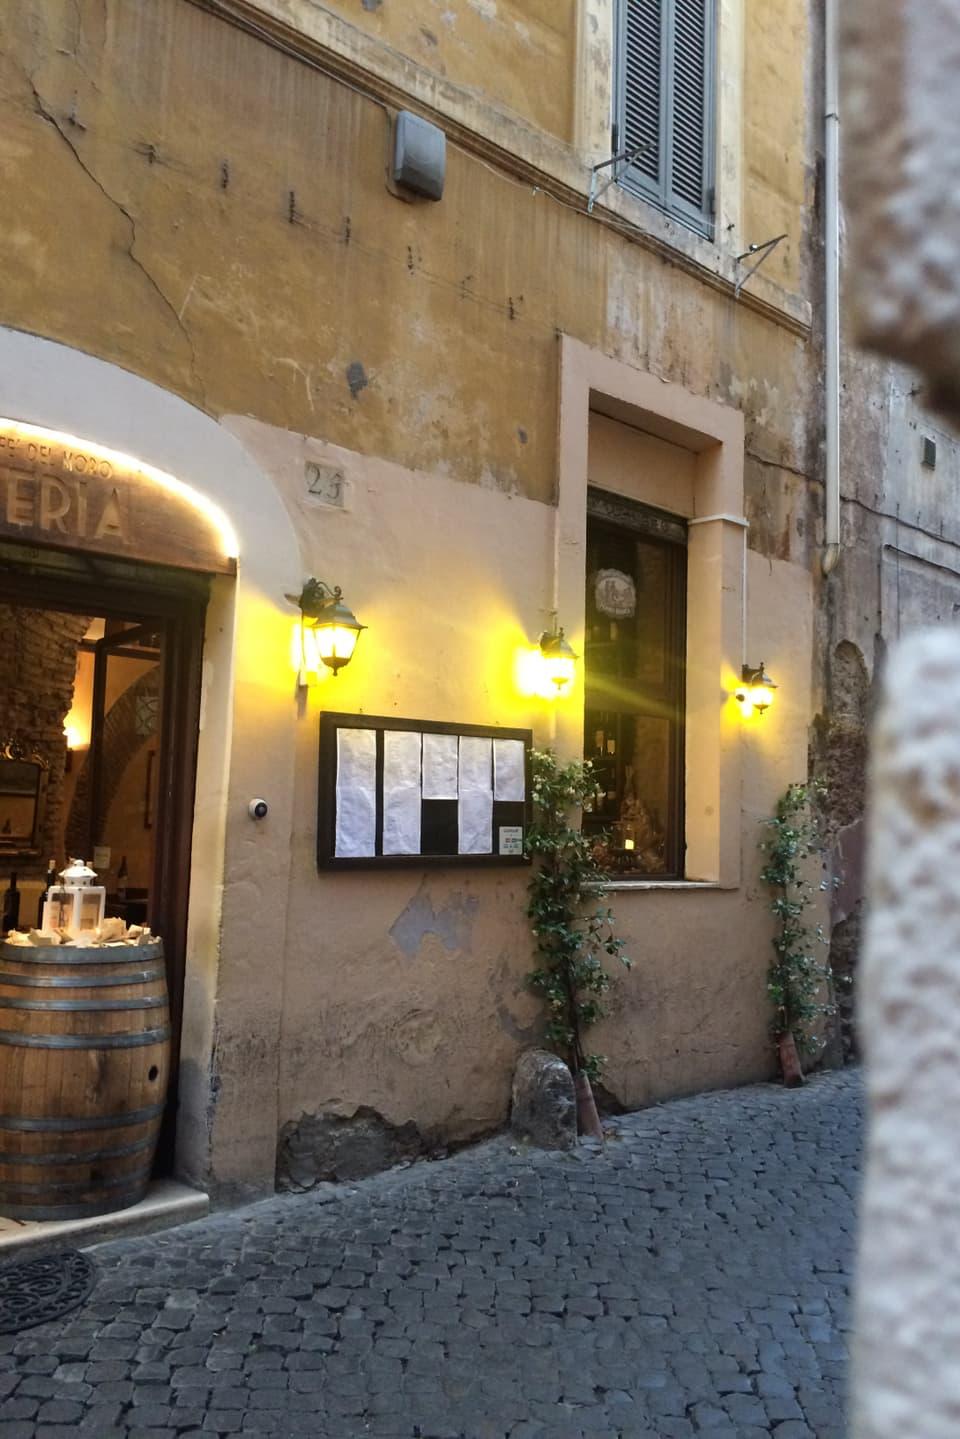 Mangiar bain a Trastevere – nagin problem. Ustarias datti era pulit avunda.